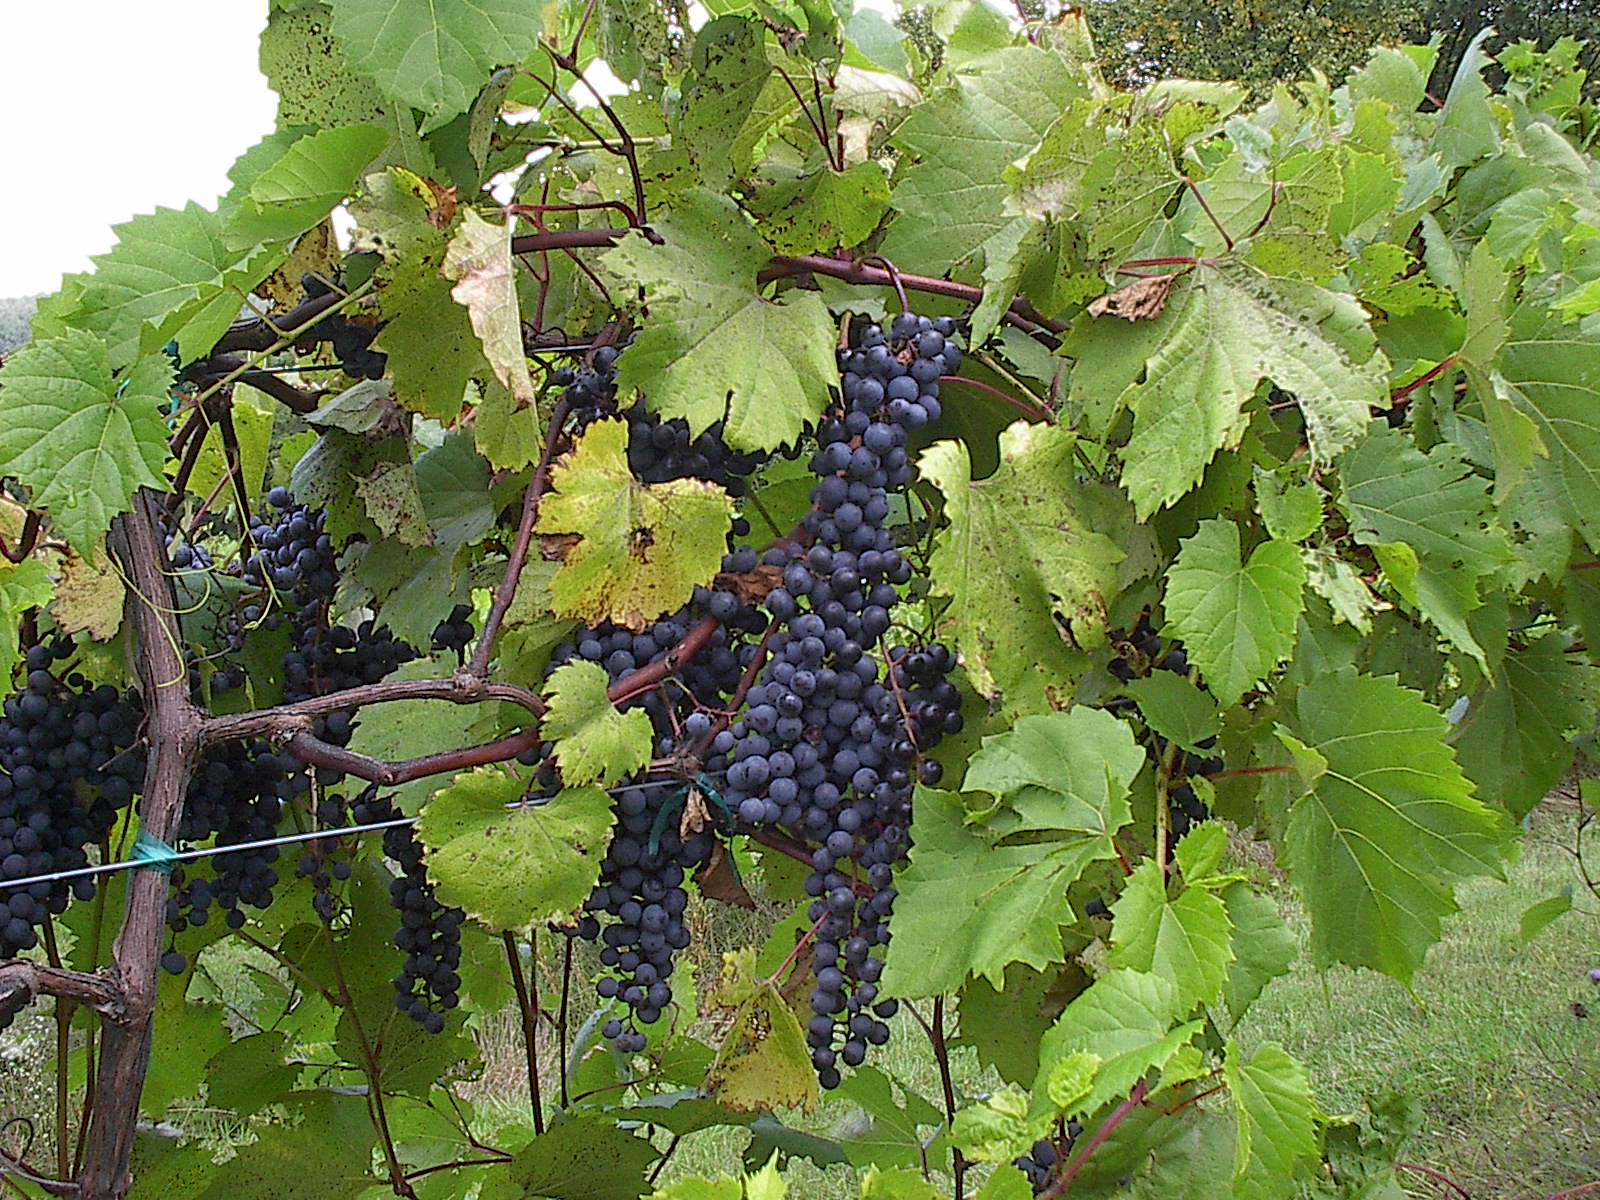 Good grapes make good wine.